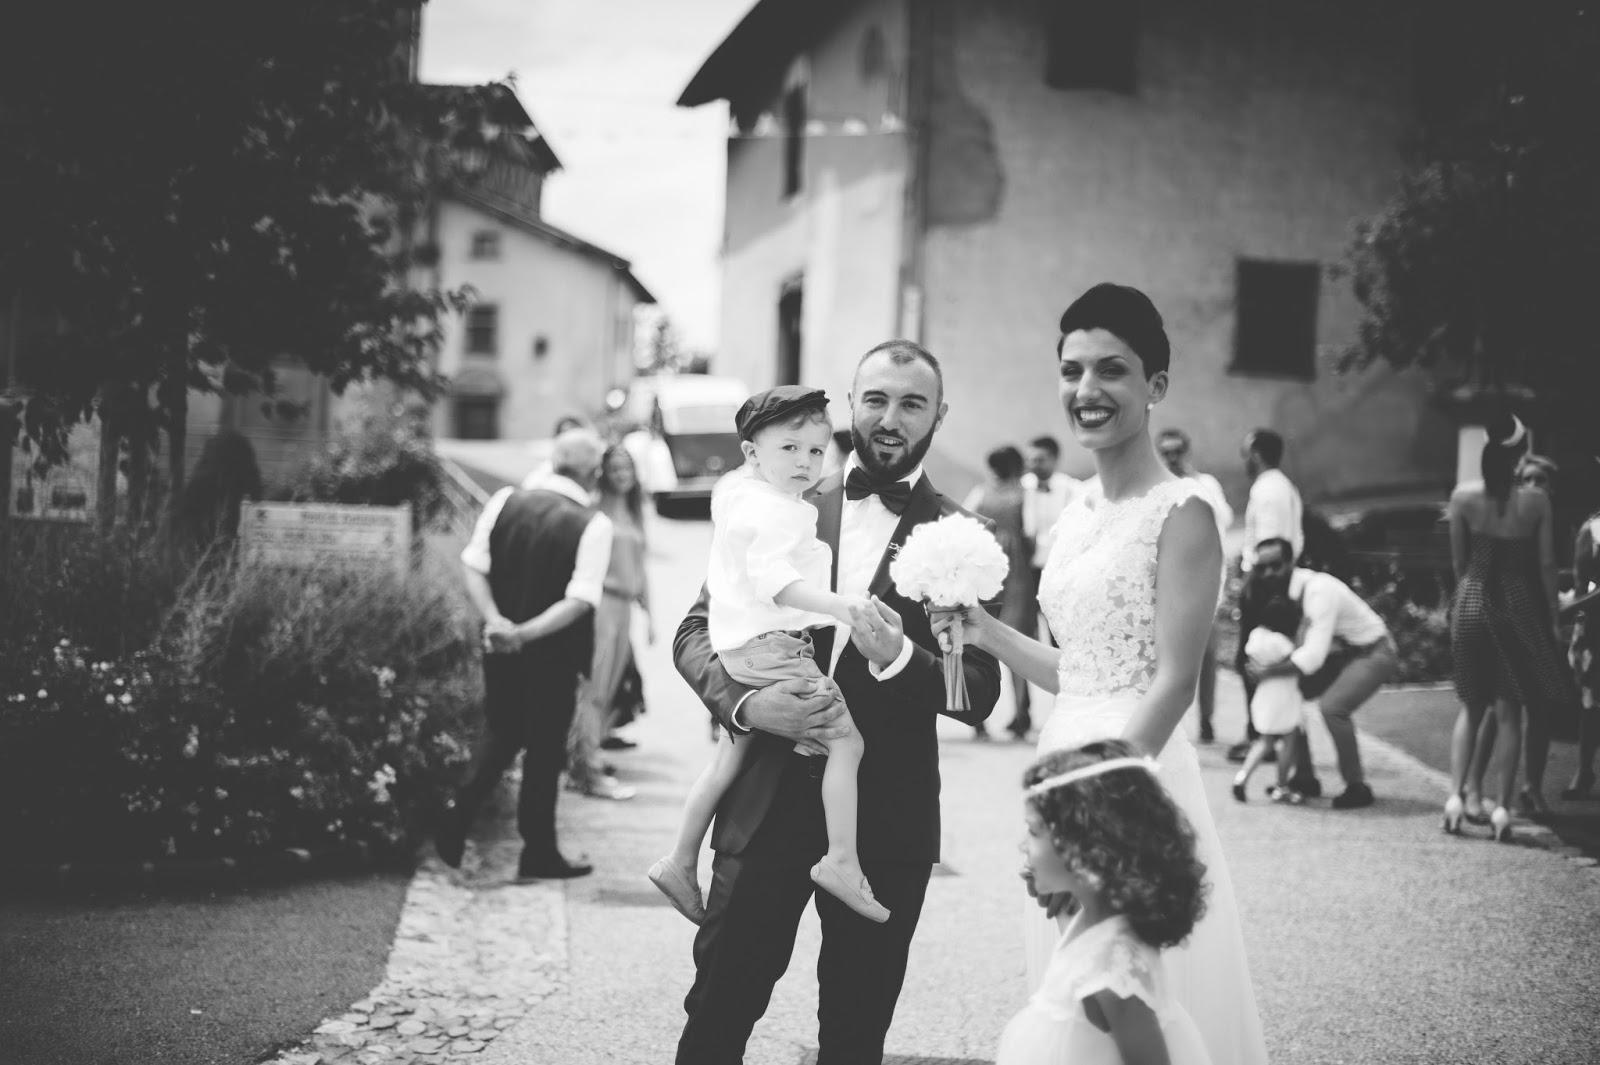 photographe mariage lyon roanne lycee agricole ressins nandax X-PRO2